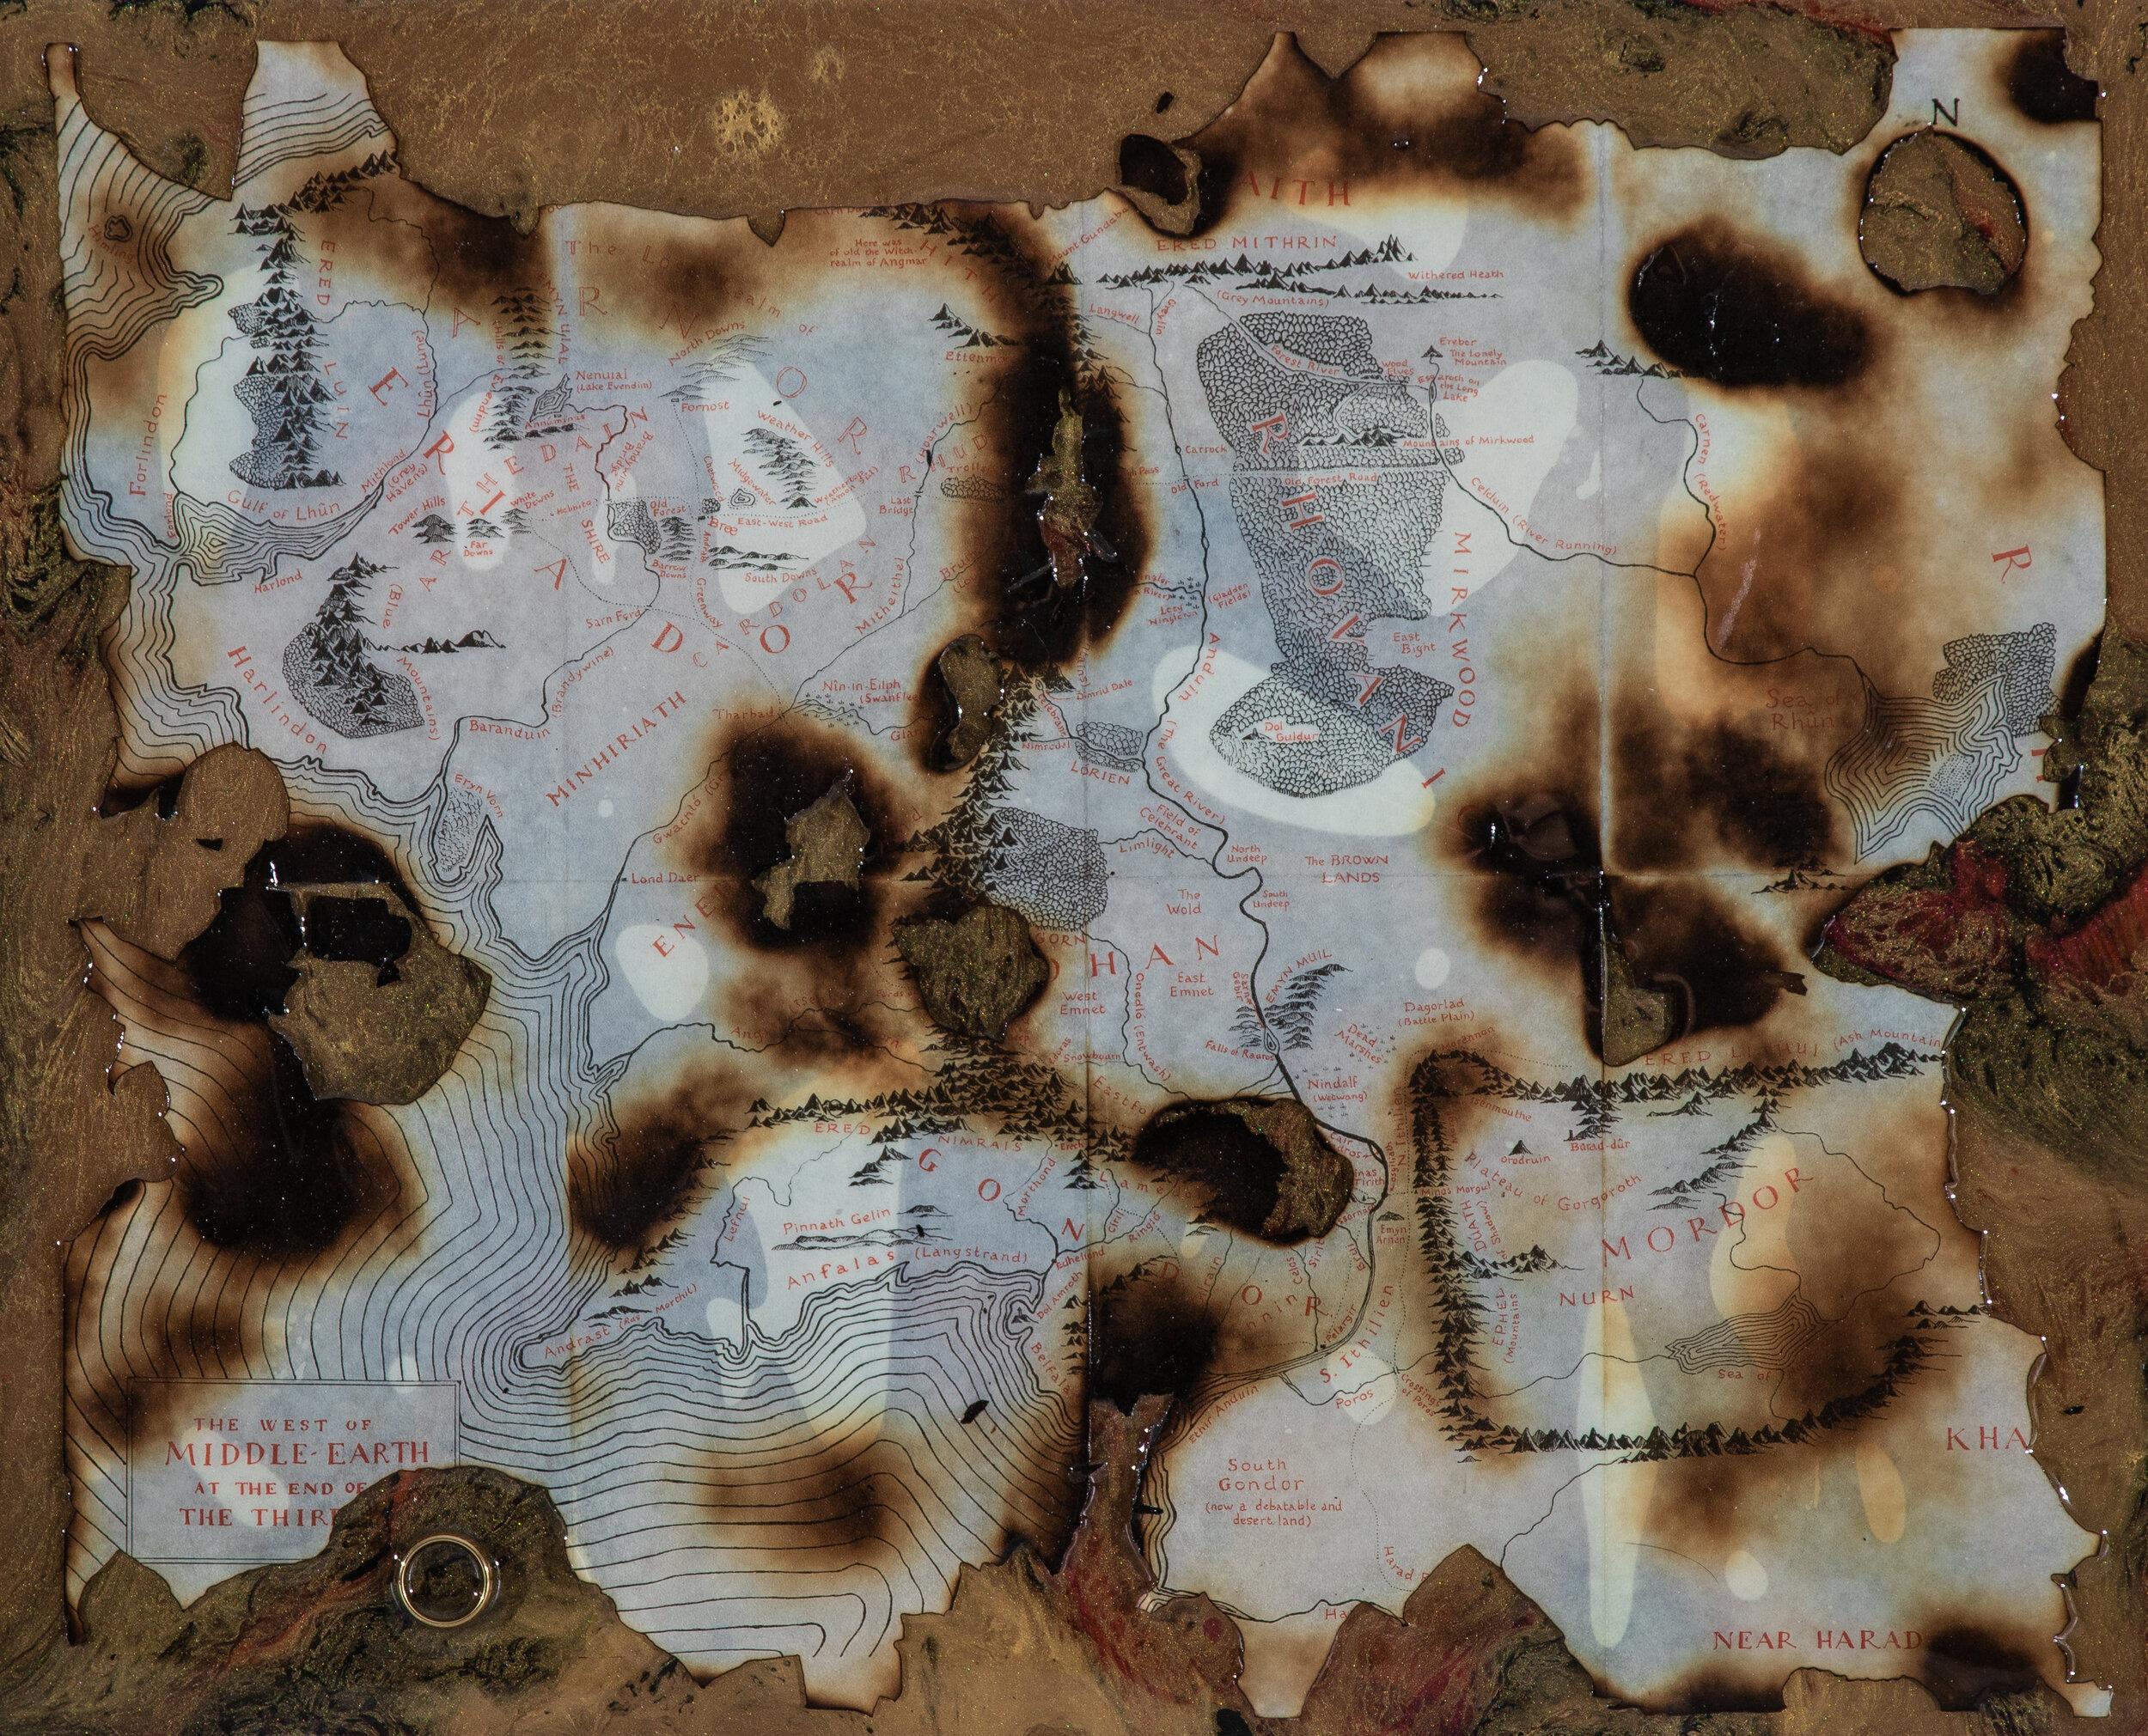 Middle Earth on Fire_Lisa_Draper.jpg